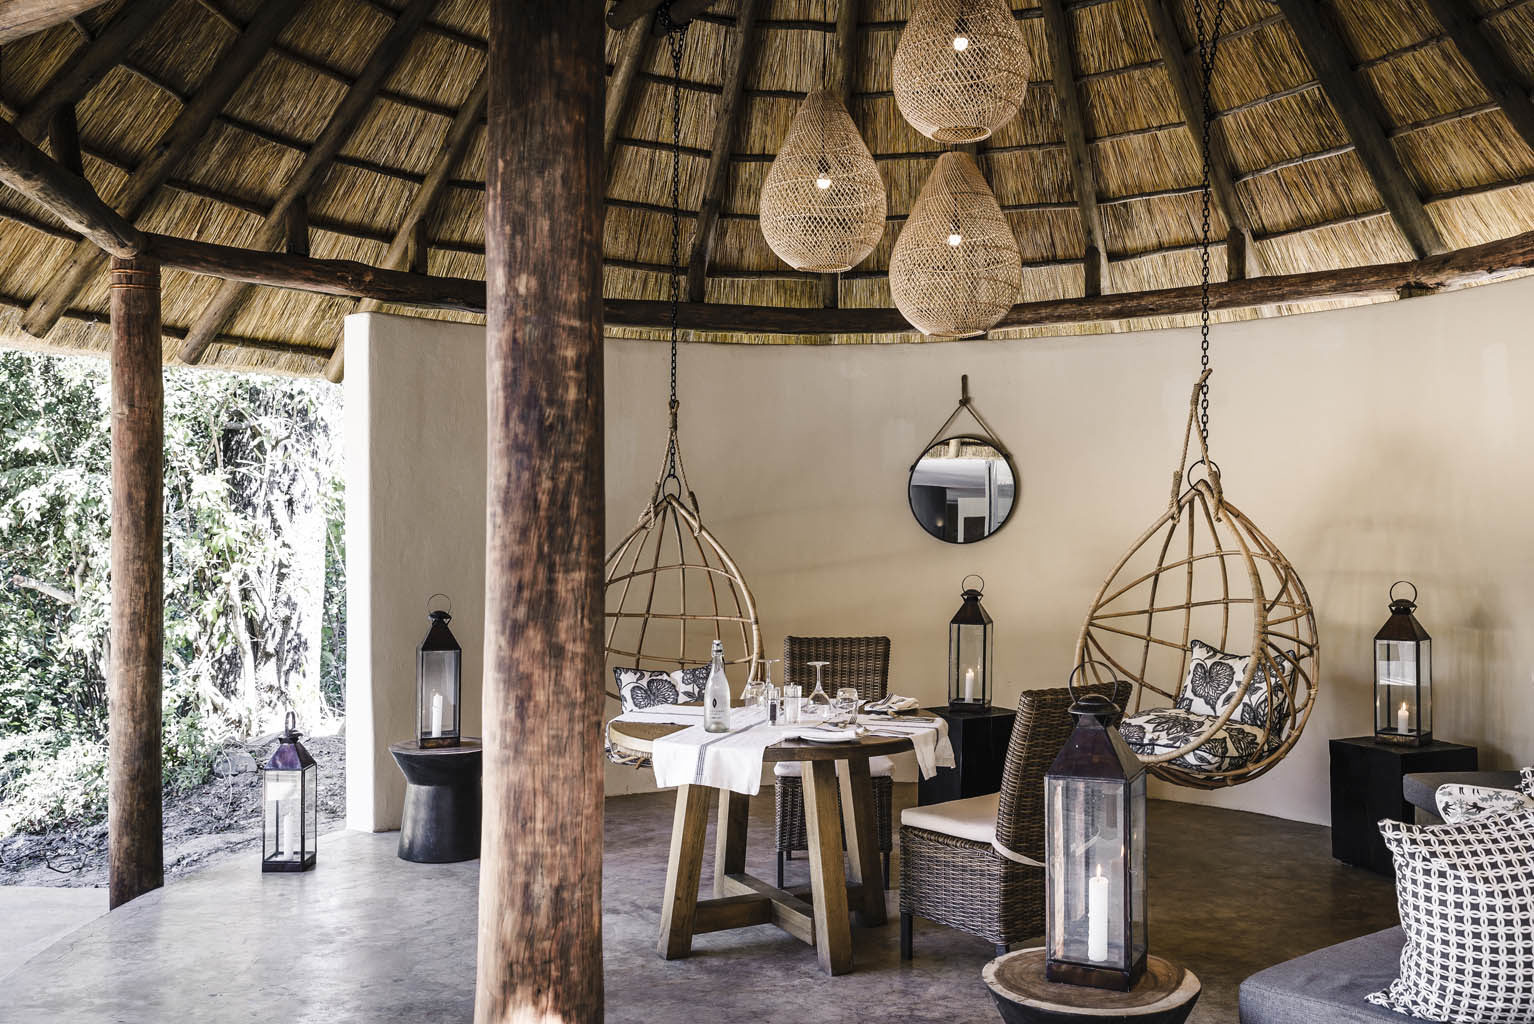 Africa, Zambia, Sanctuary Sussi & Shuma